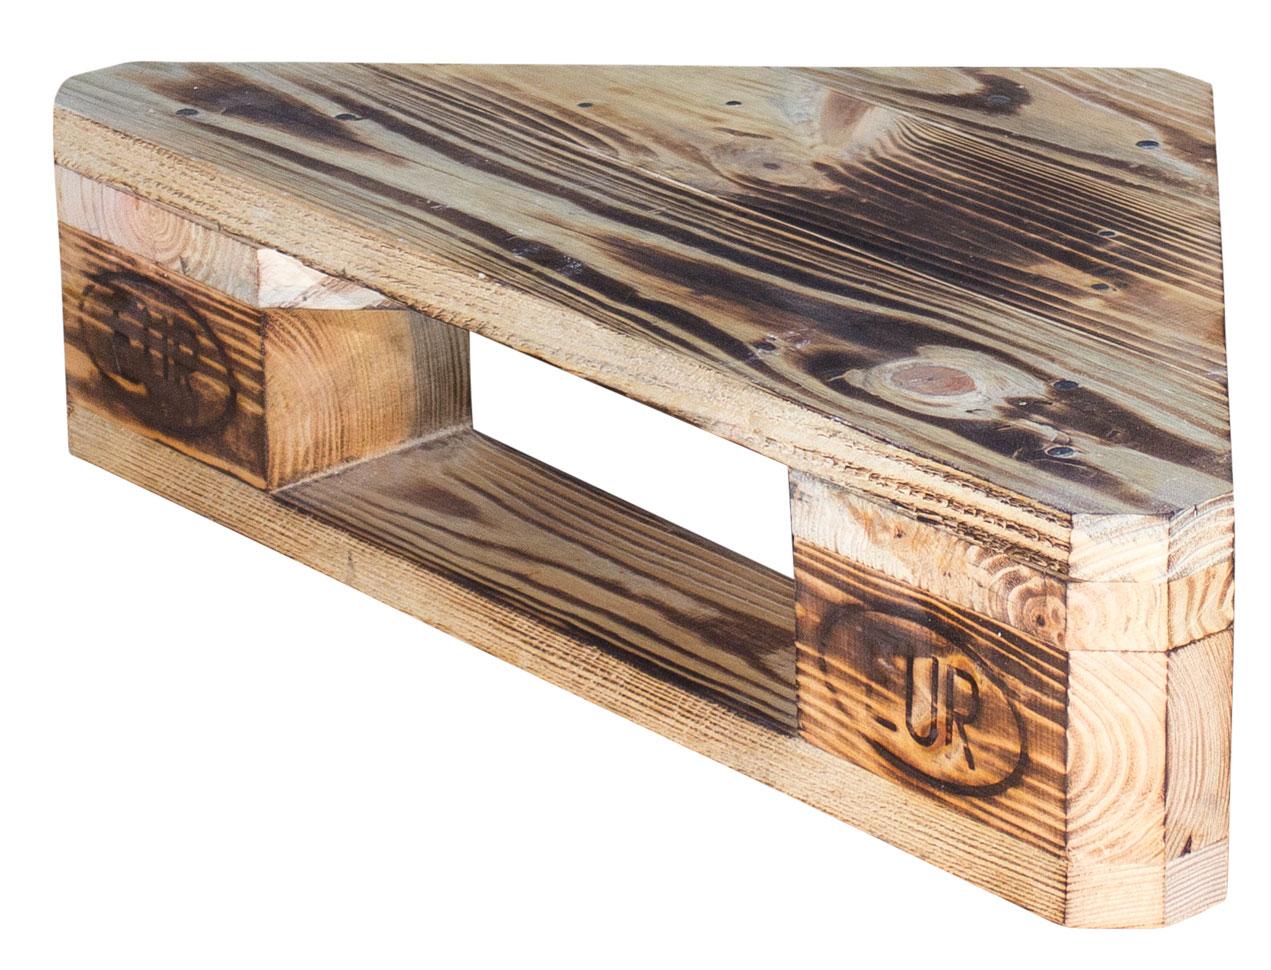 m bel aus paletten geflammtes eckregal aus palettenholz 60x44x14 5cm. Black Bedroom Furniture Sets. Home Design Ideas